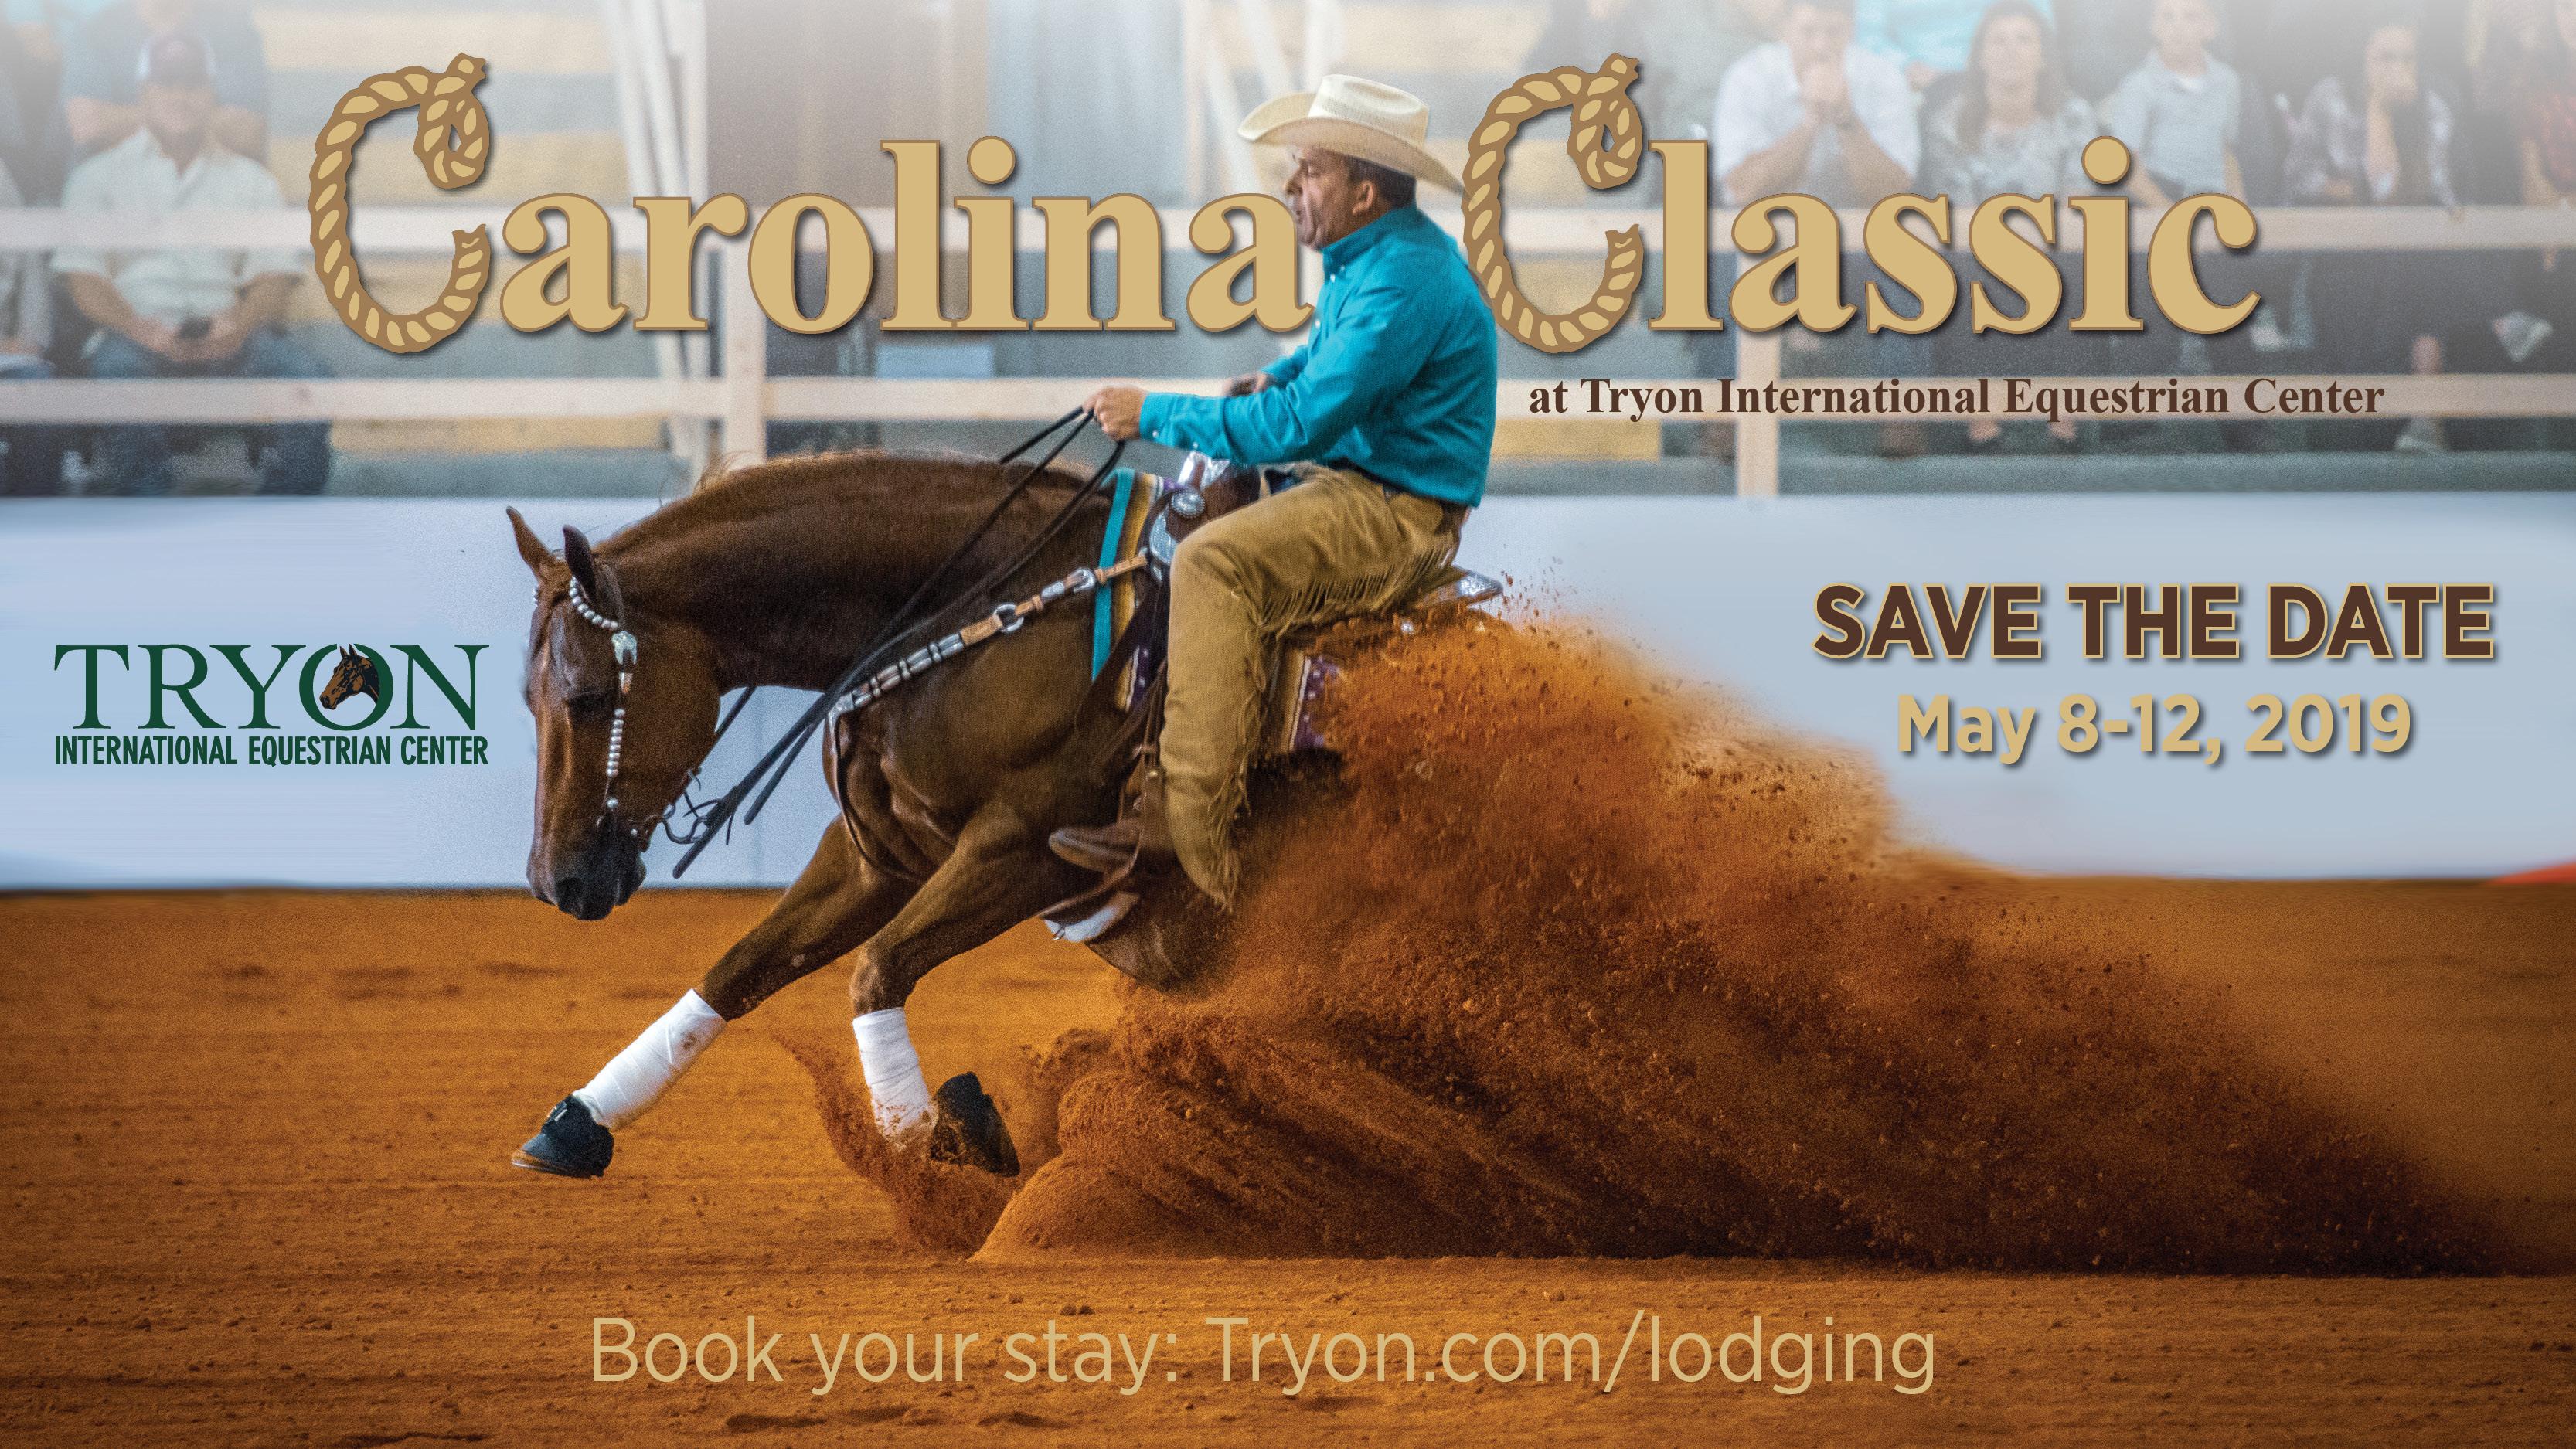 STD Carolina Classic 19 800x450-4